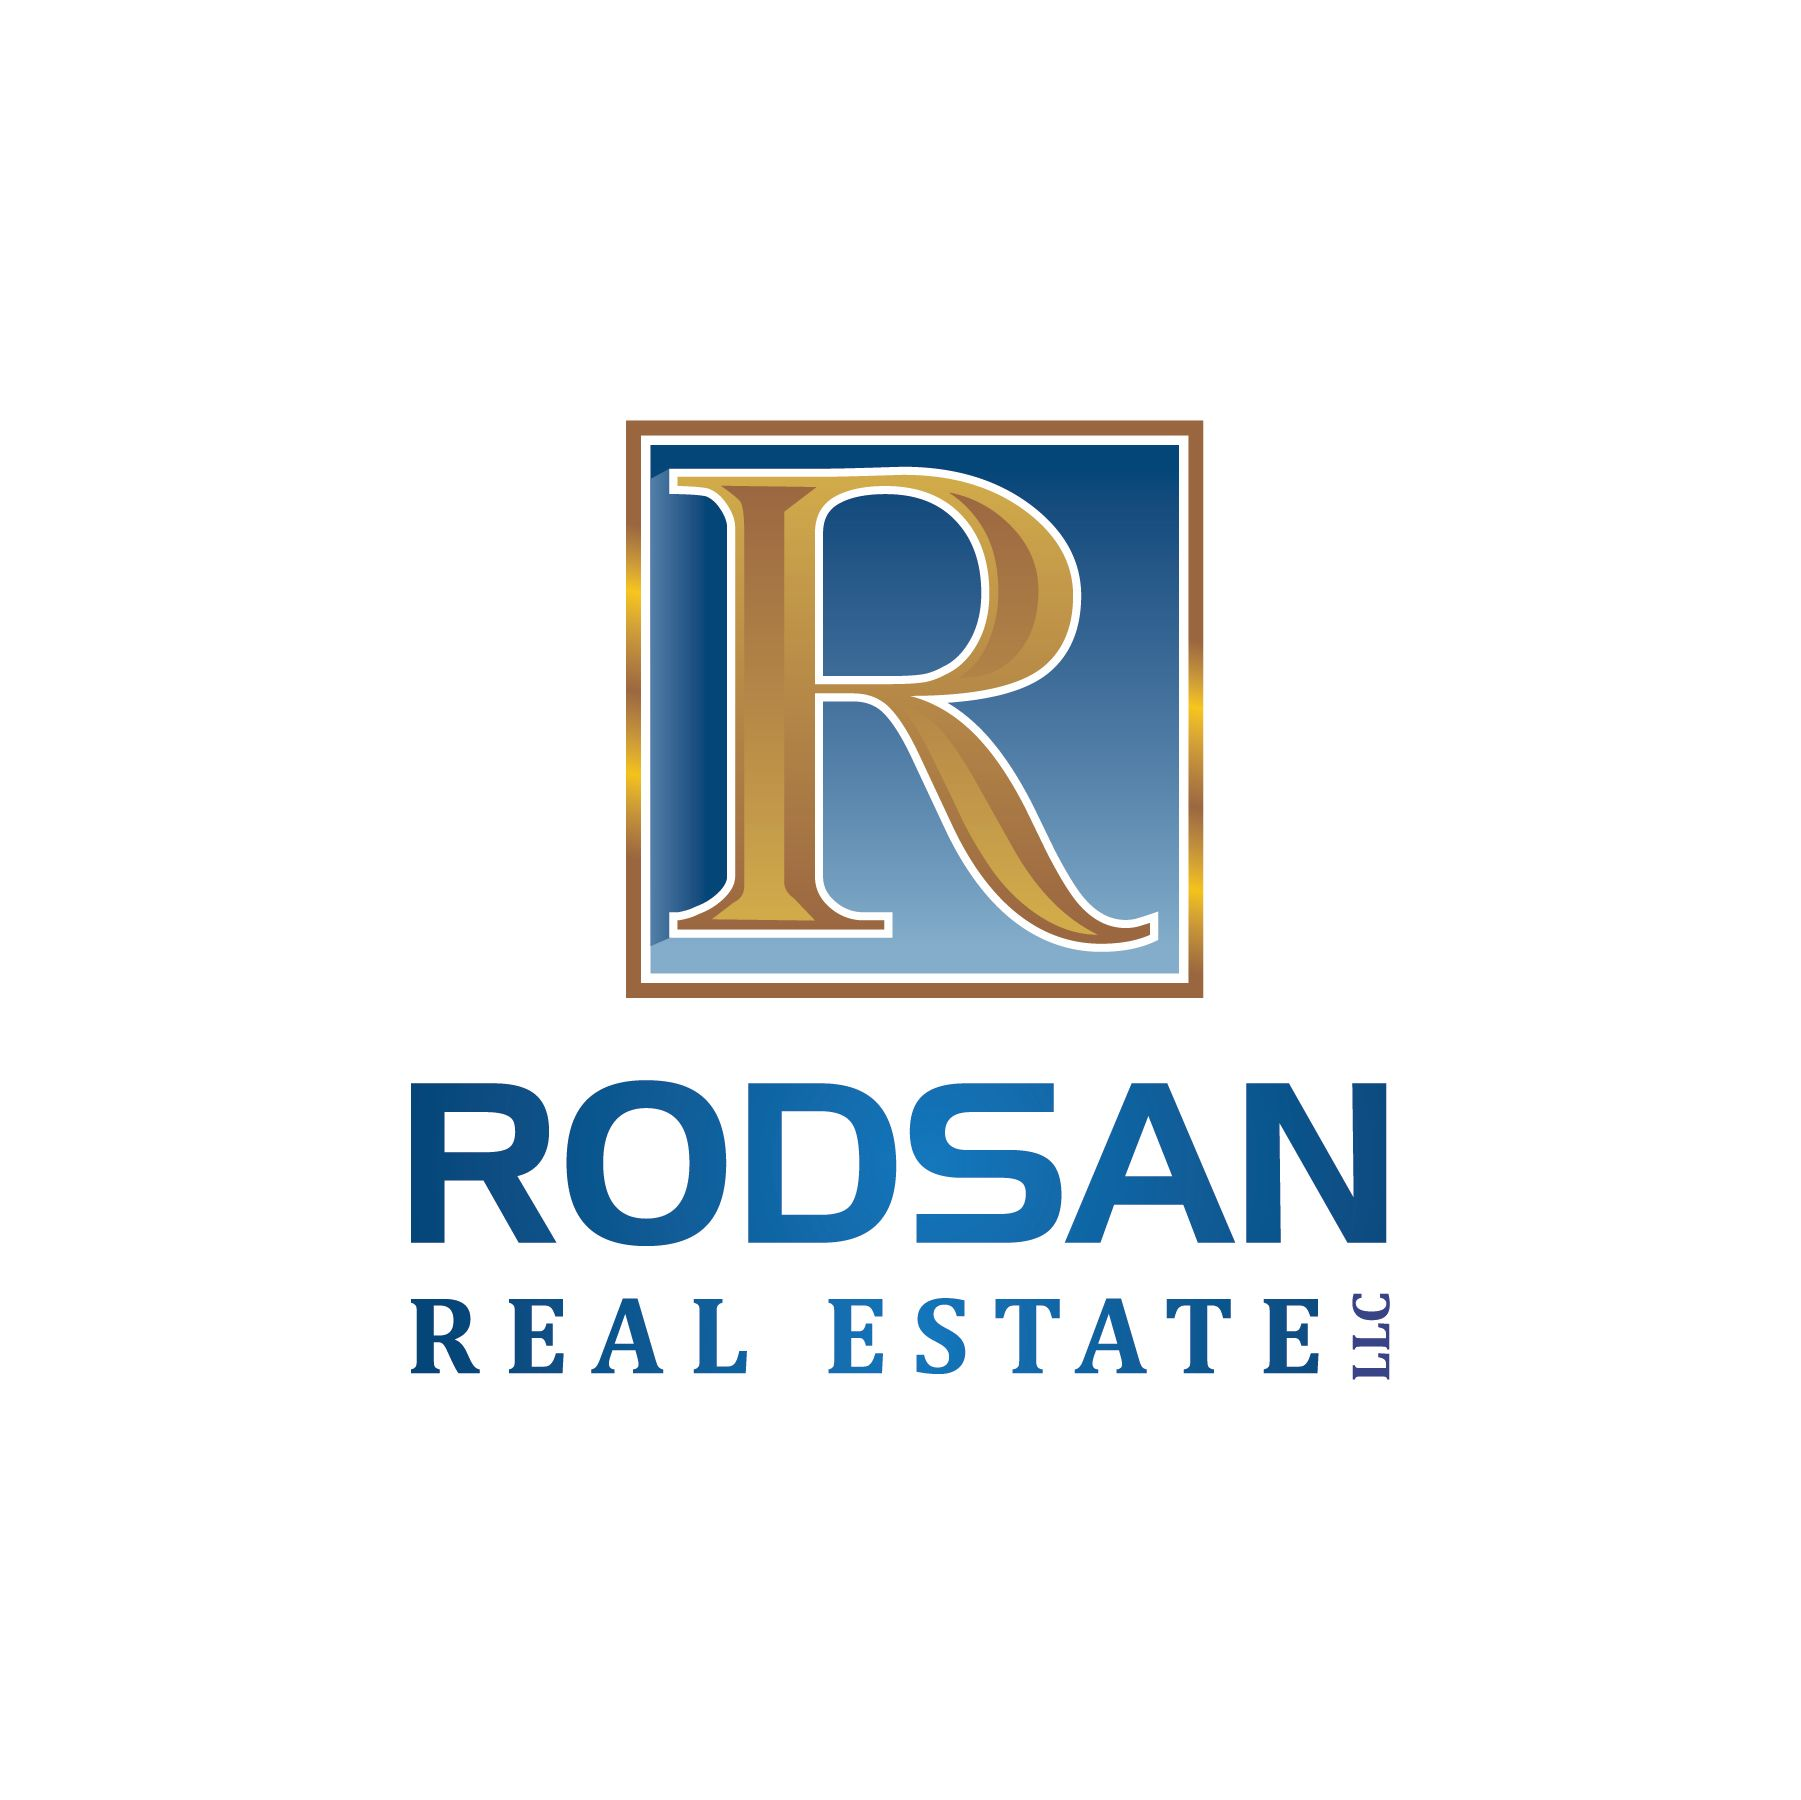 Rodsan Real Estate LLC